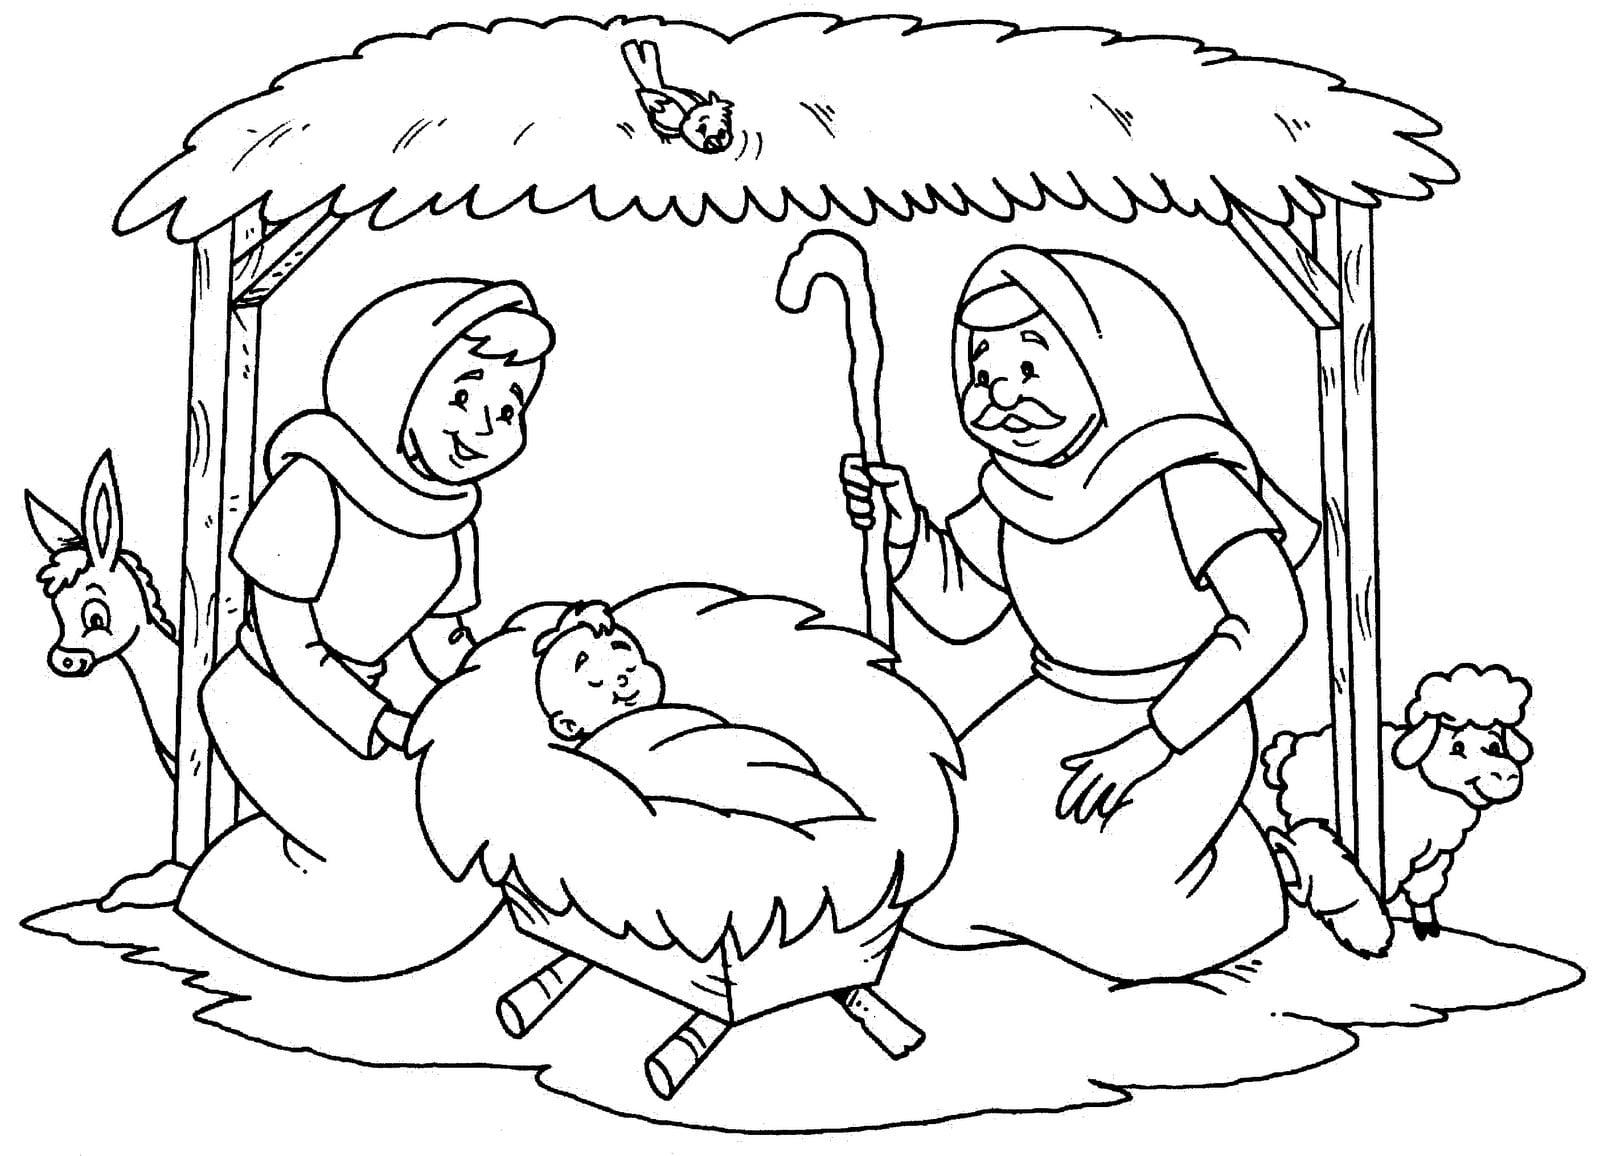 Desenho Para Colorir De Jesus